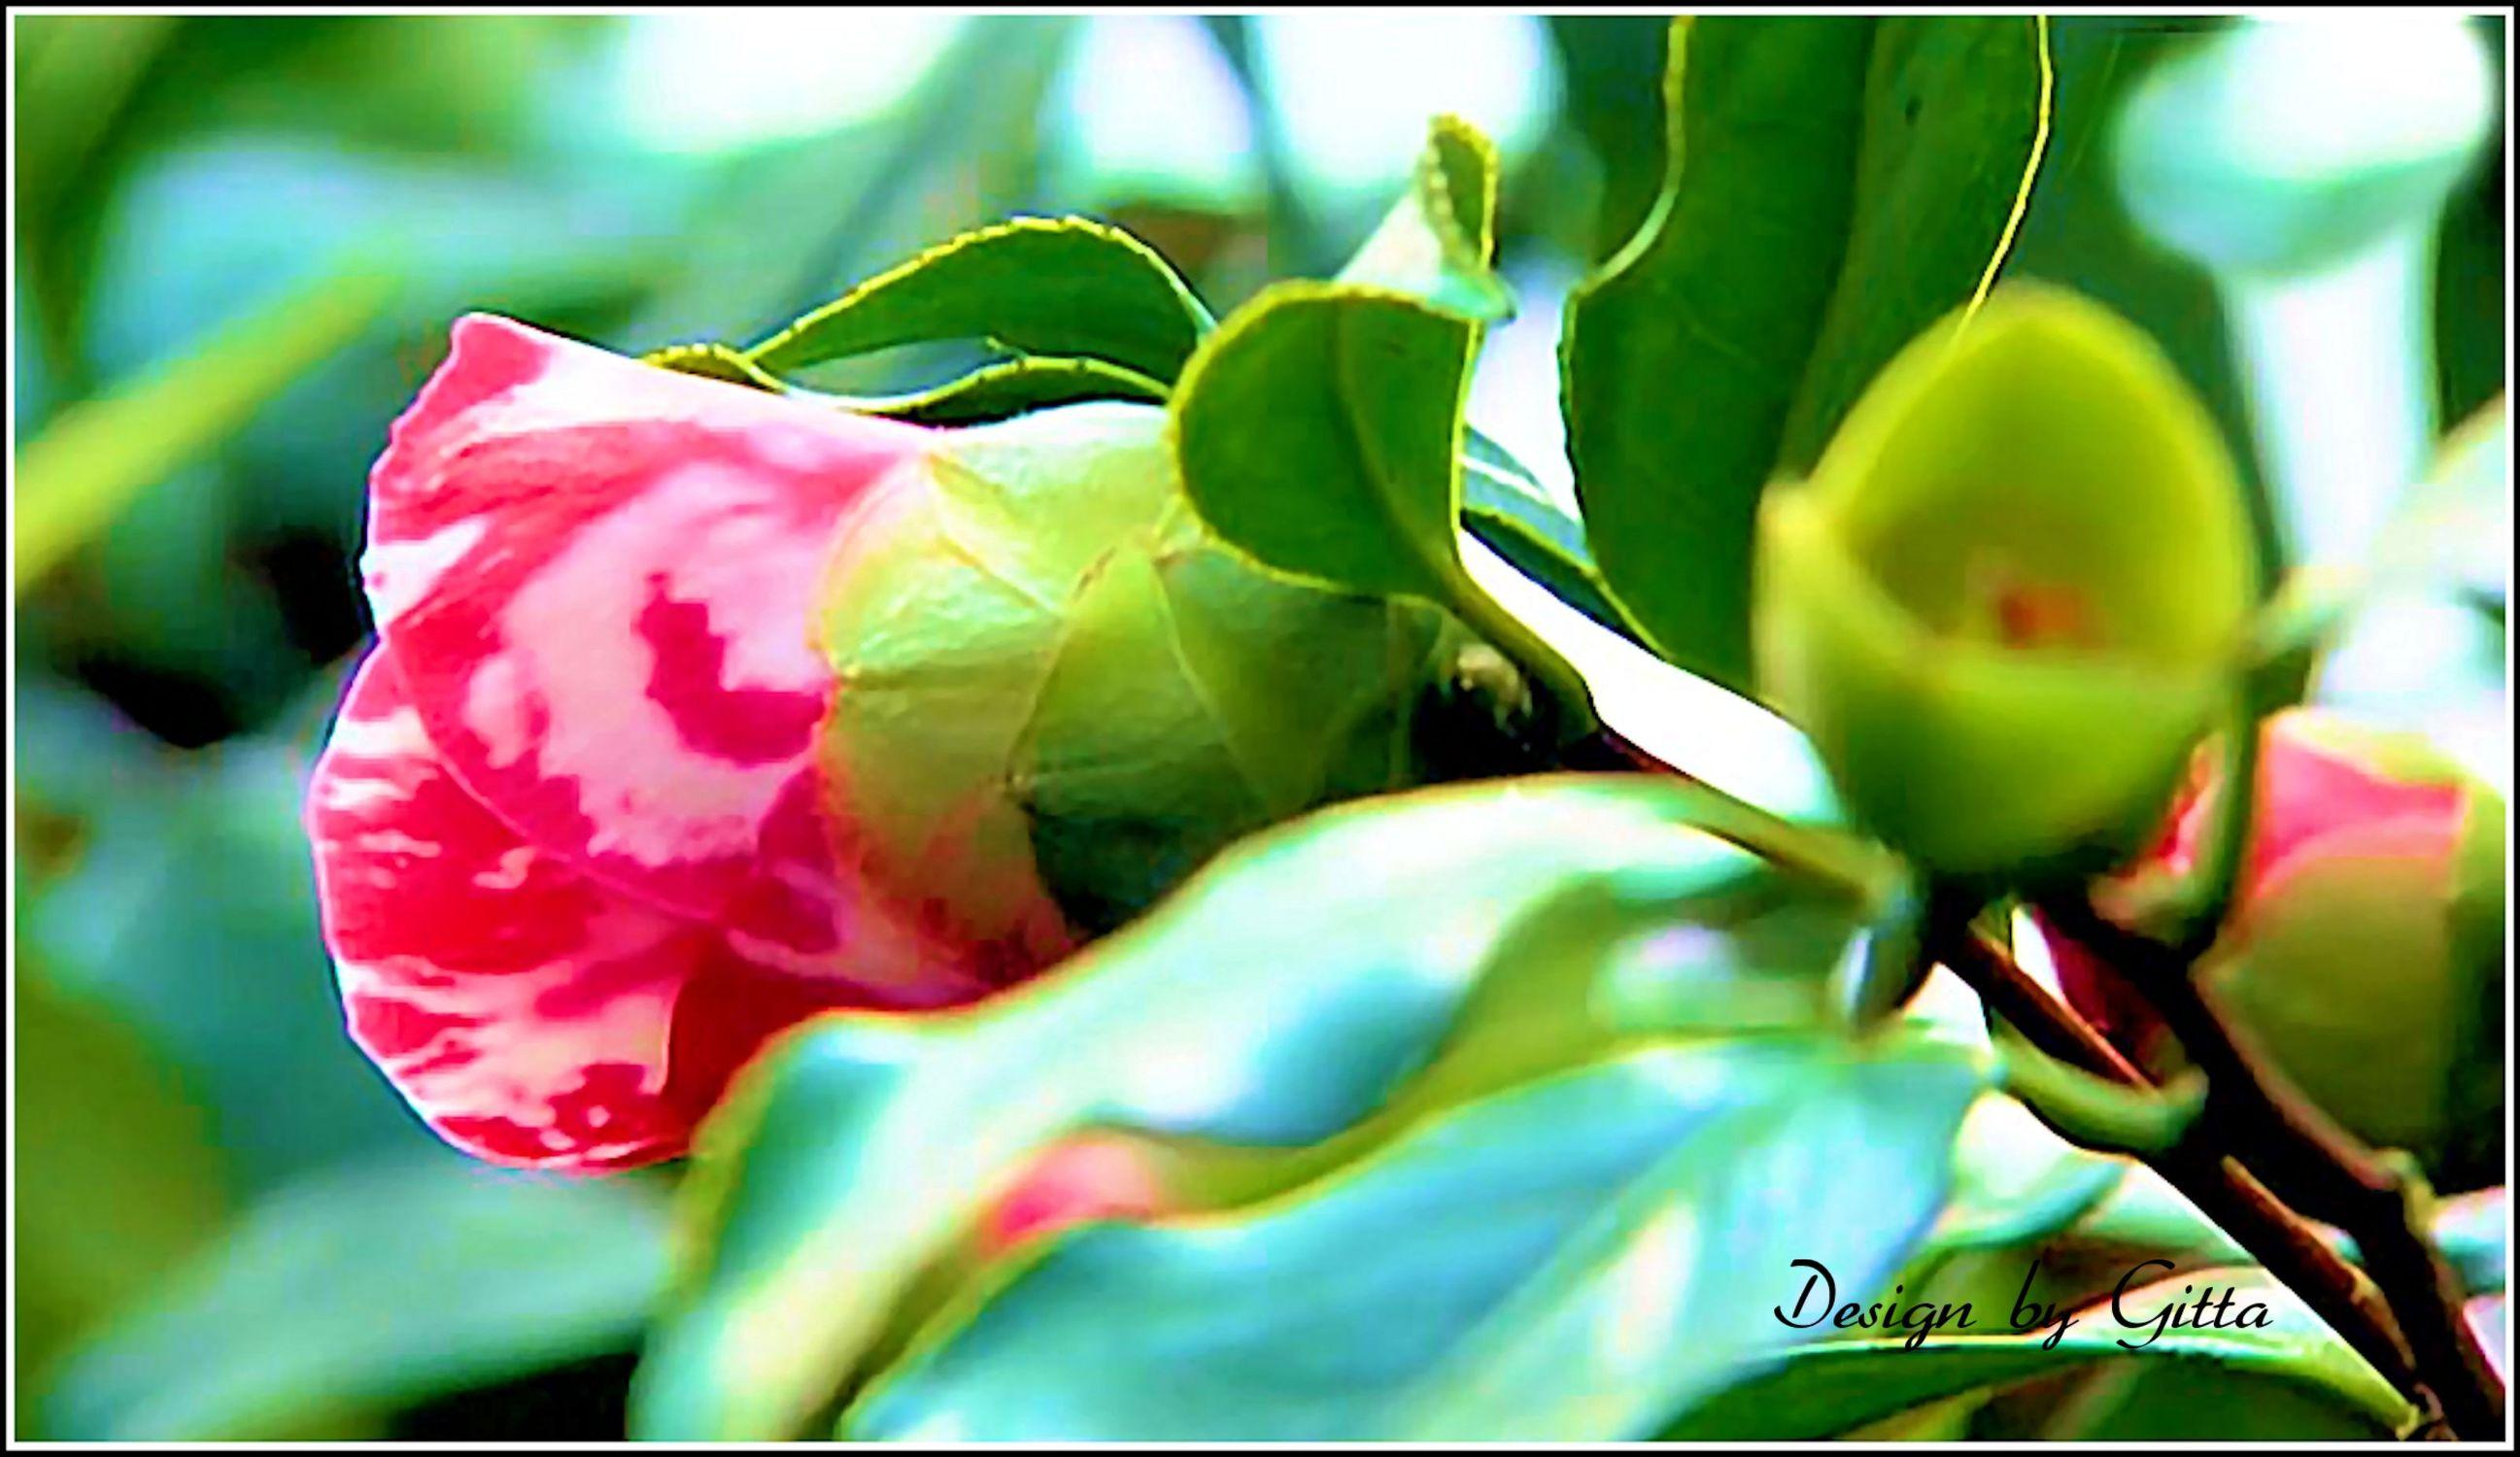 Bild mit Blumen, Rosen, Blume, Rose, Rosenblüte, blütenkompositionen, Blüten, Makrobilder, Makroaufnahmen